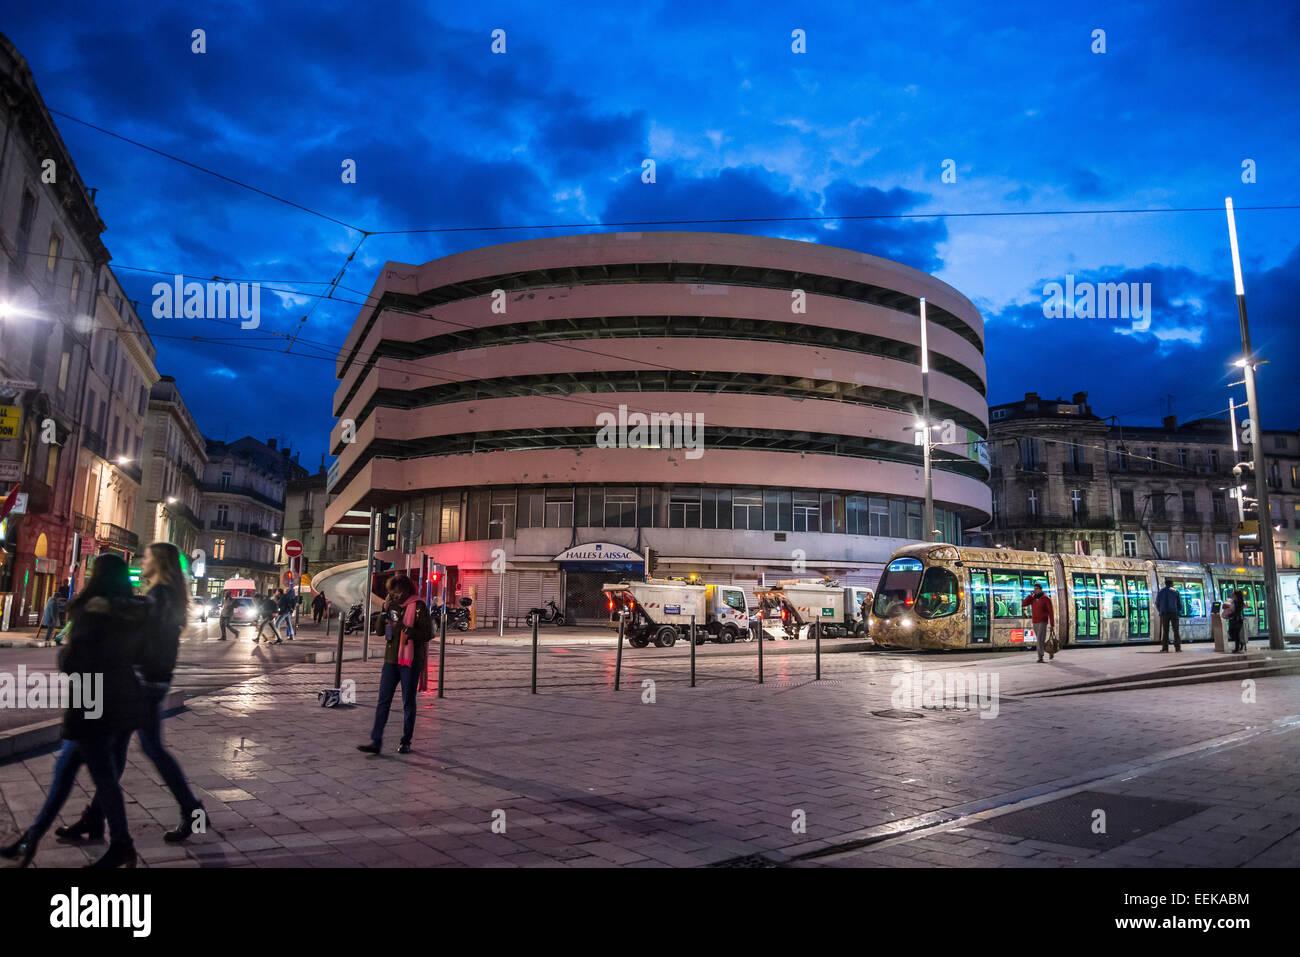 Halles Laissac, Multistory parking envisaged for demolition, Montpellier, France - Stock Image